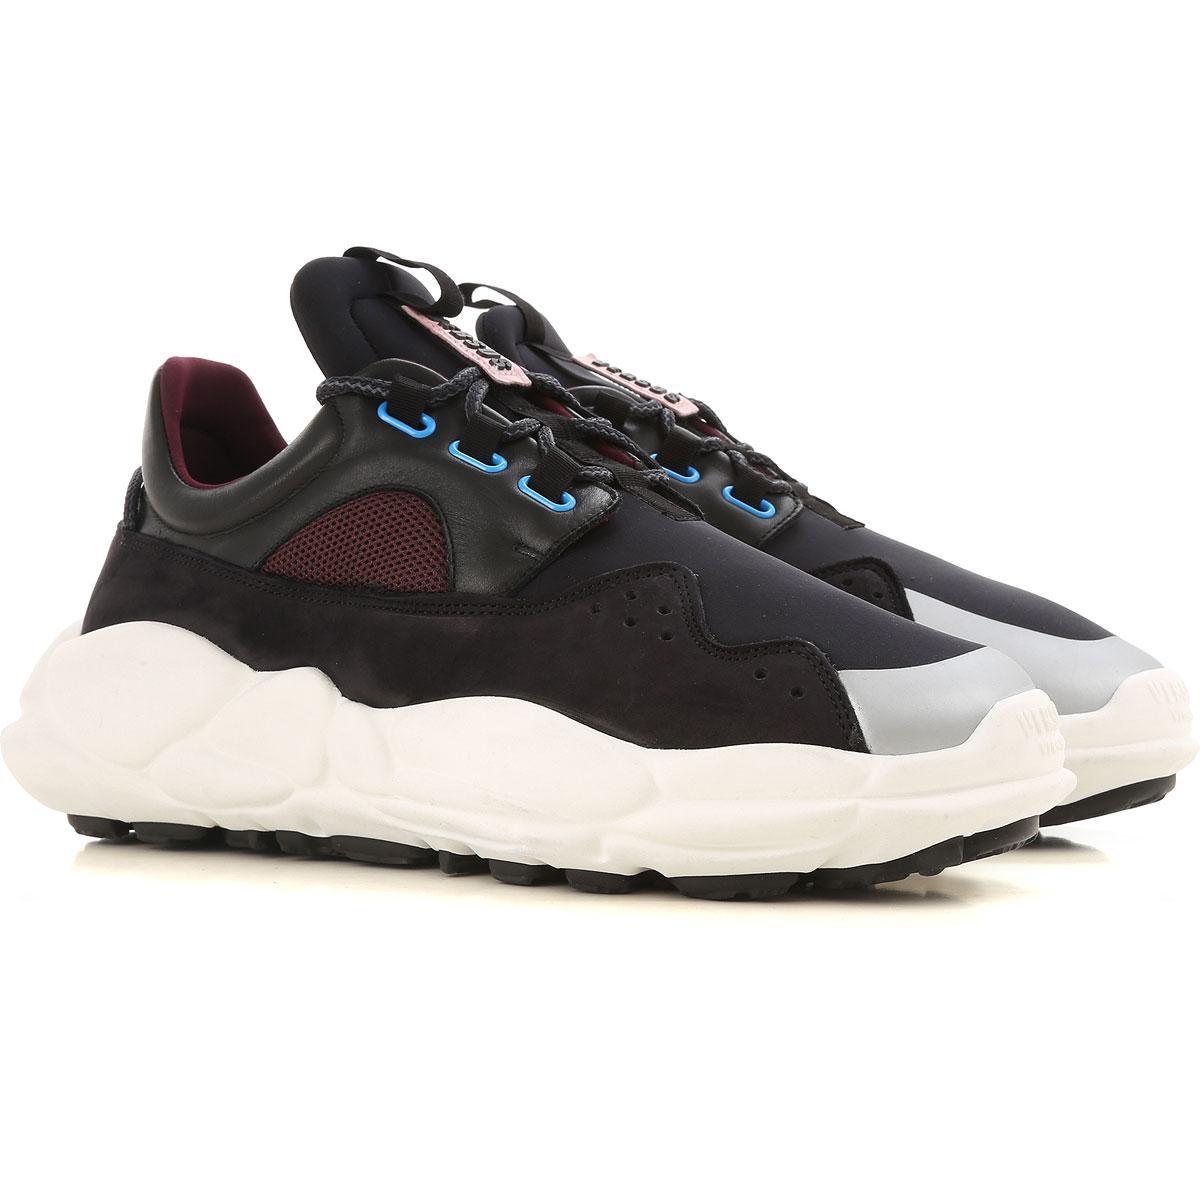 943094e2b51 Versace Shoes For Men in Black for Men - Lyst